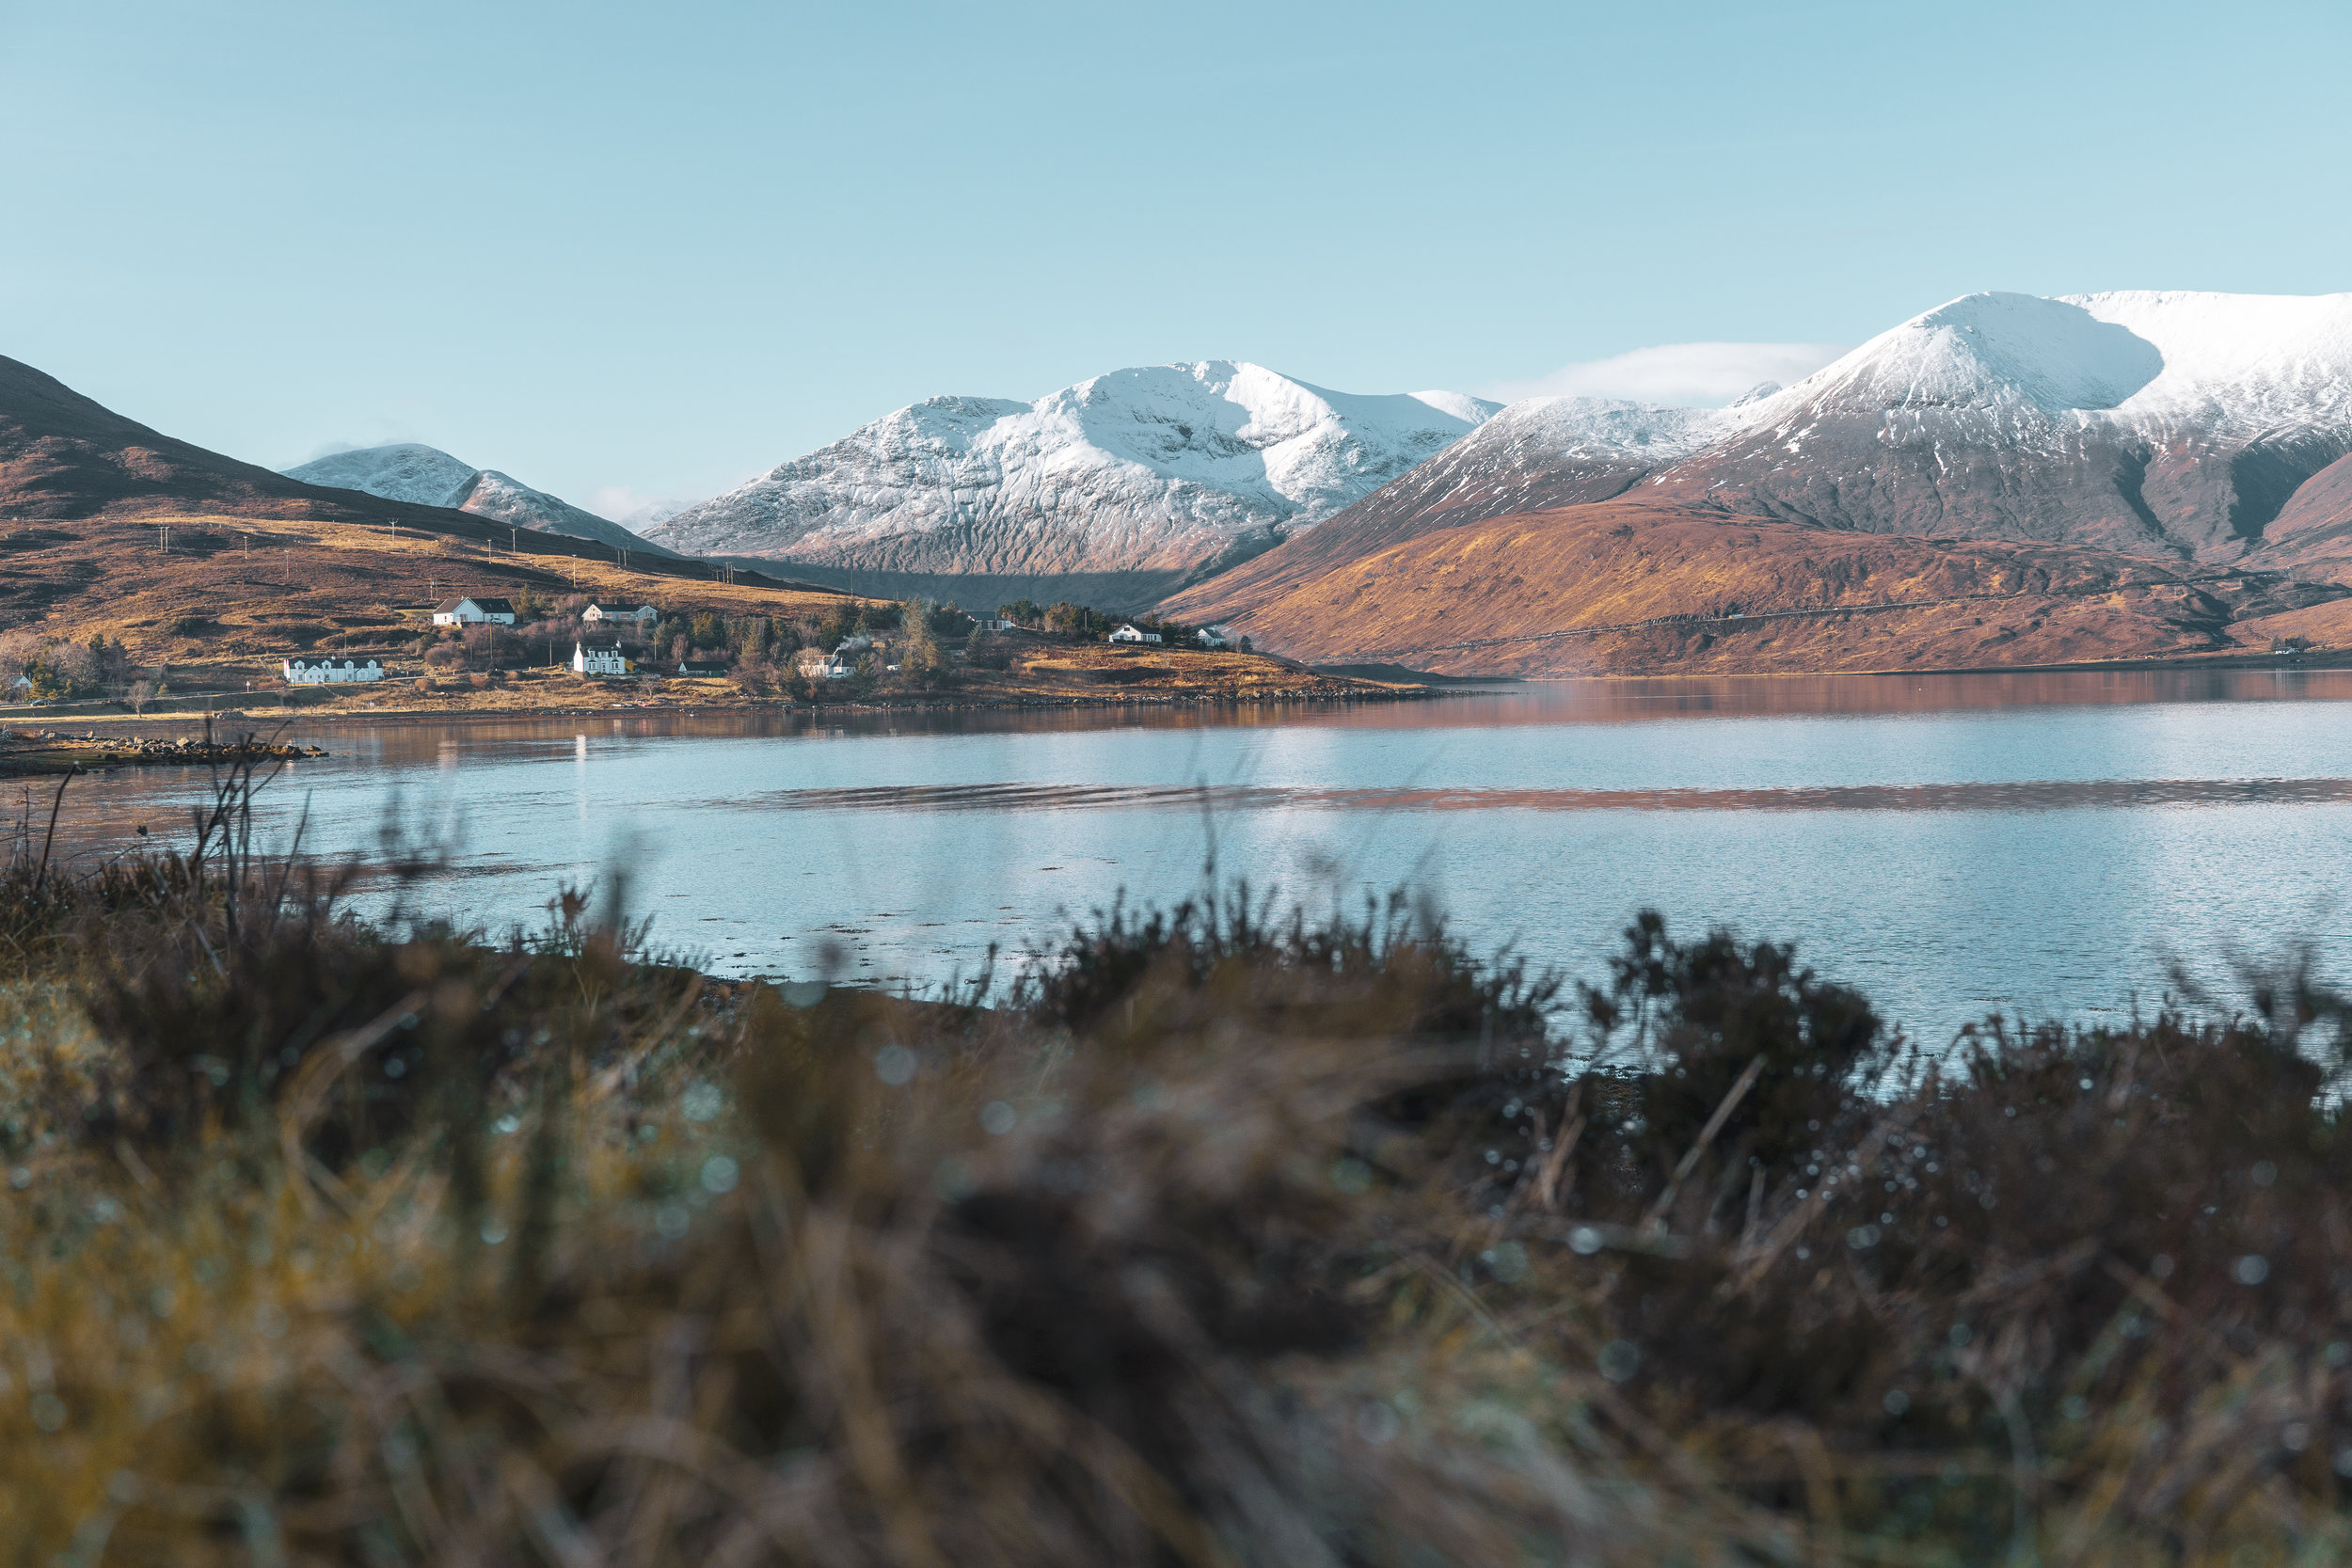 Isle-of-Skye-Eilean-Donan (7).jpg